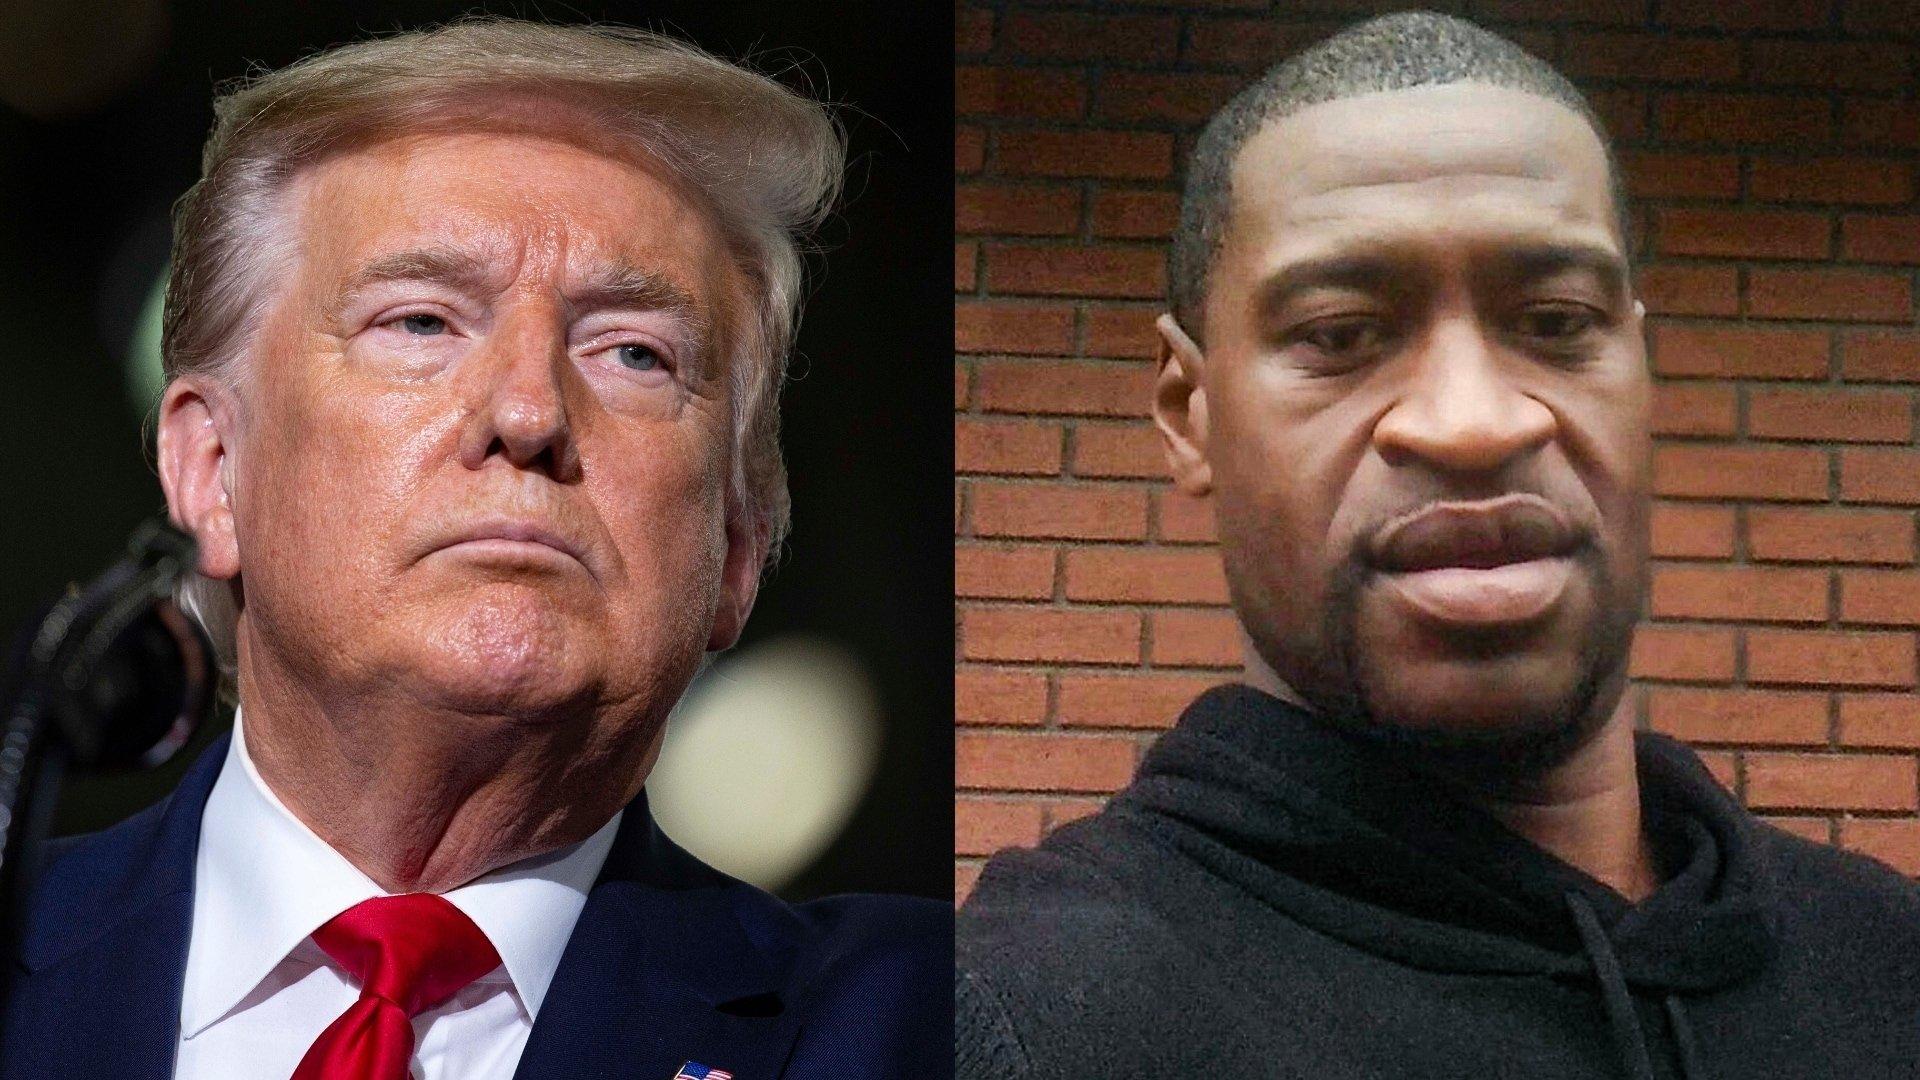 Trump's F-bomb rant about 'the Blacks'